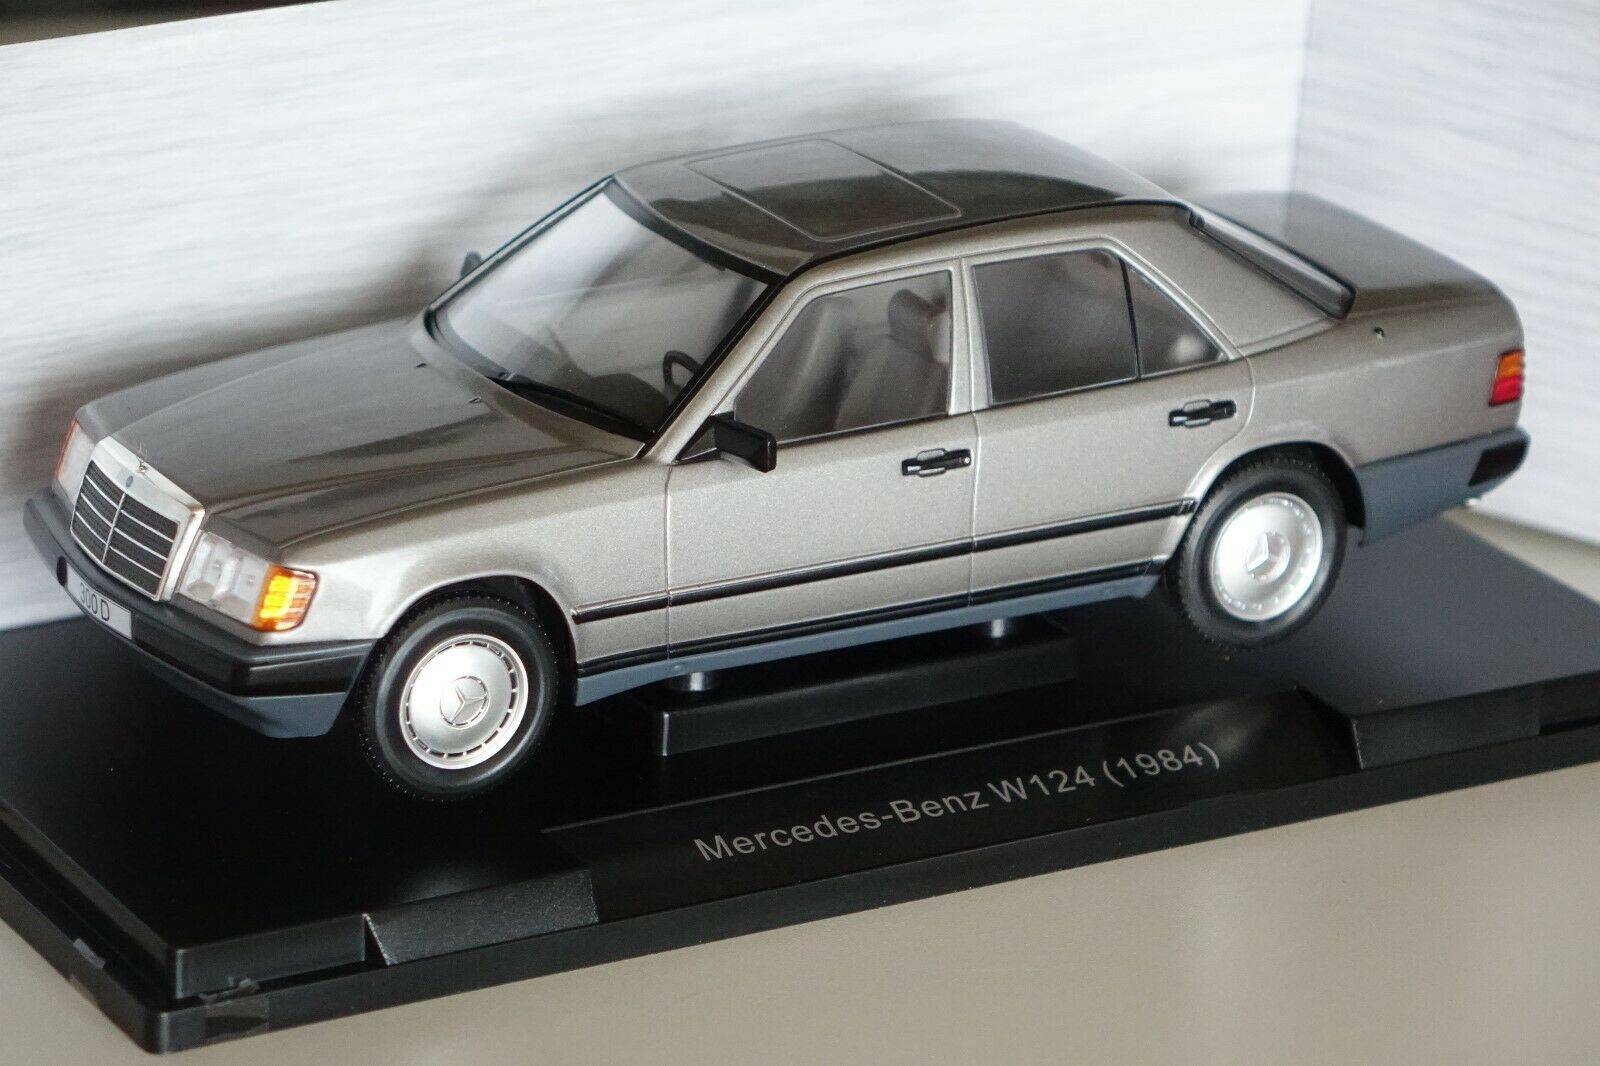 Mercedes 300 d w124 1984 gris oscuro metalizado 1 18 microg 18100 nuevo & OVP